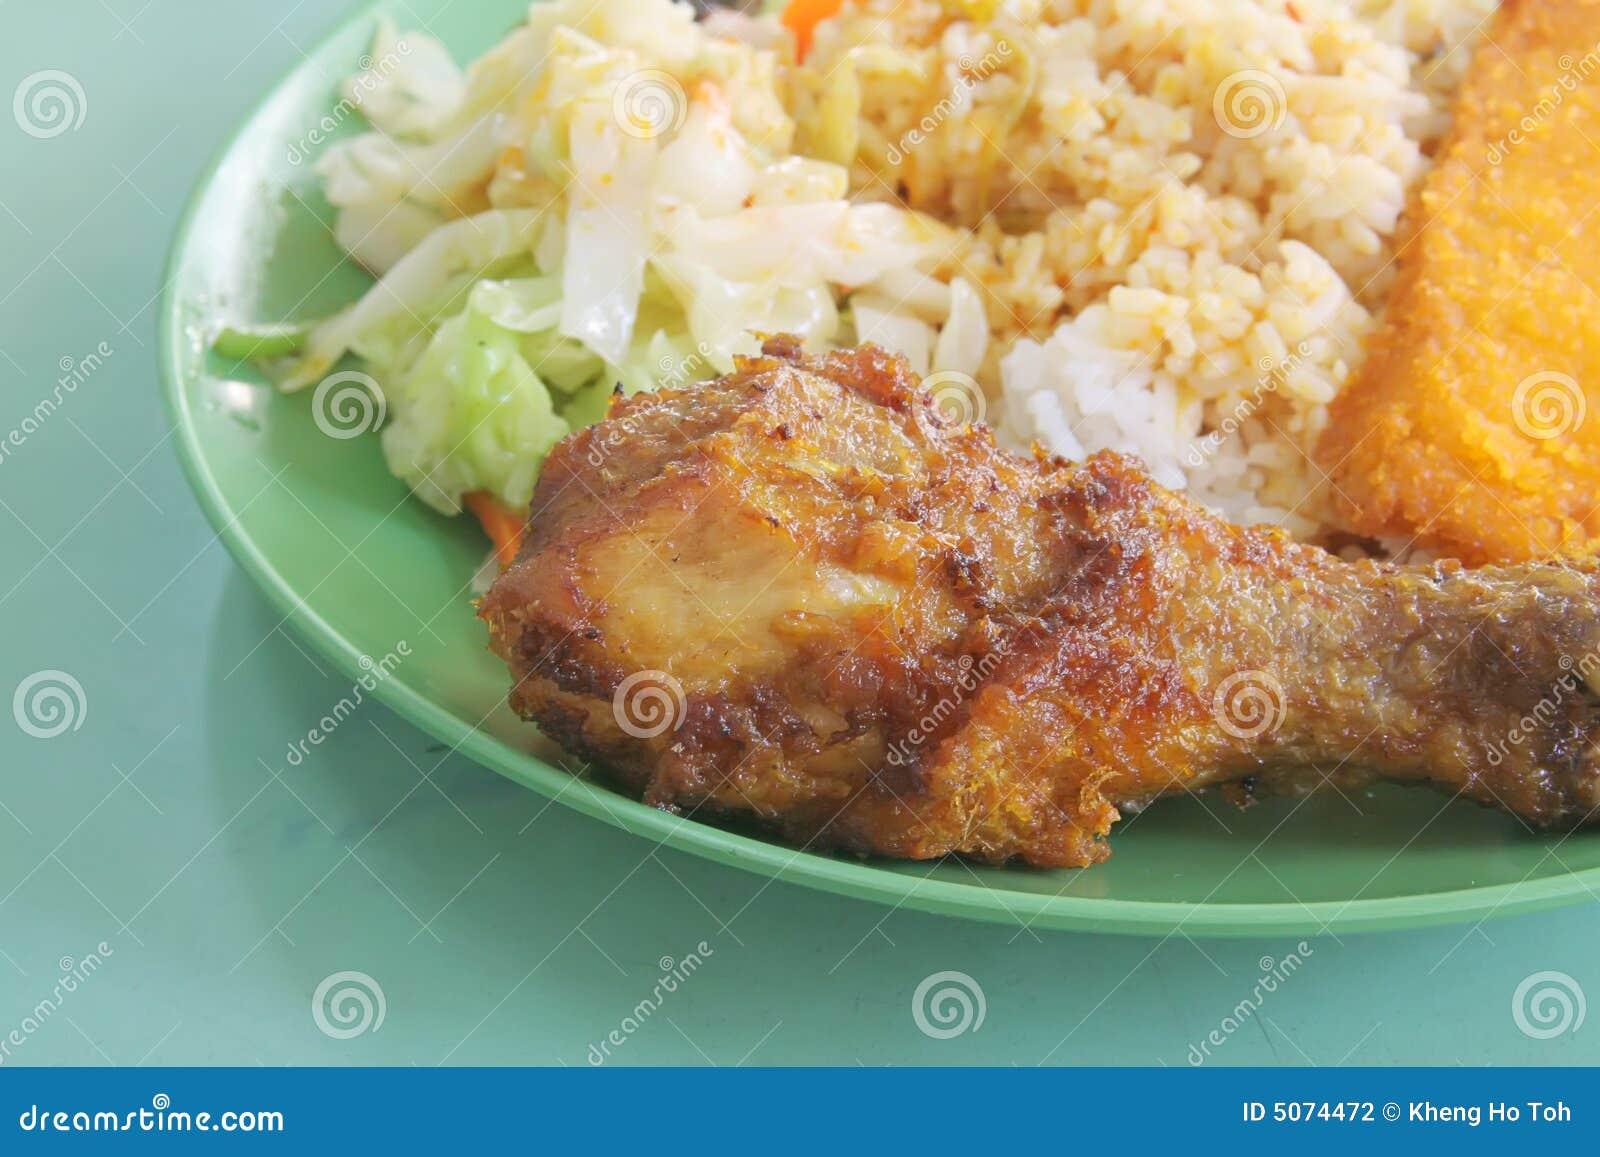 Local Asian Hawker Mixed Rice Food Fare